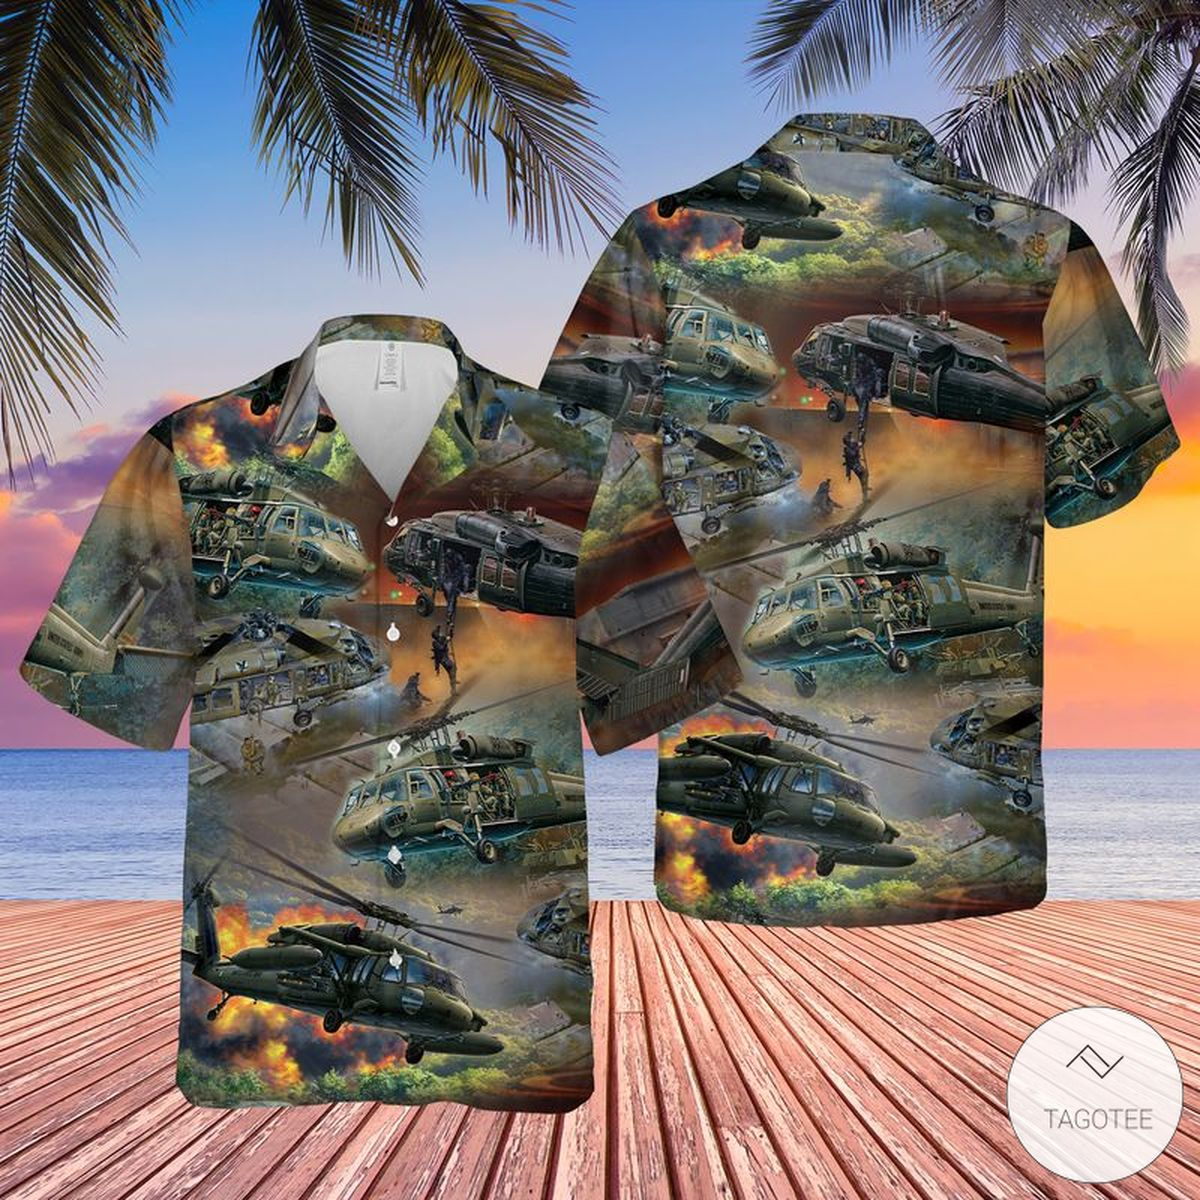 United States Army Sikorsky UH-60 Black Hawk Helicopter Hawaiian Shirt, Beach Shorts